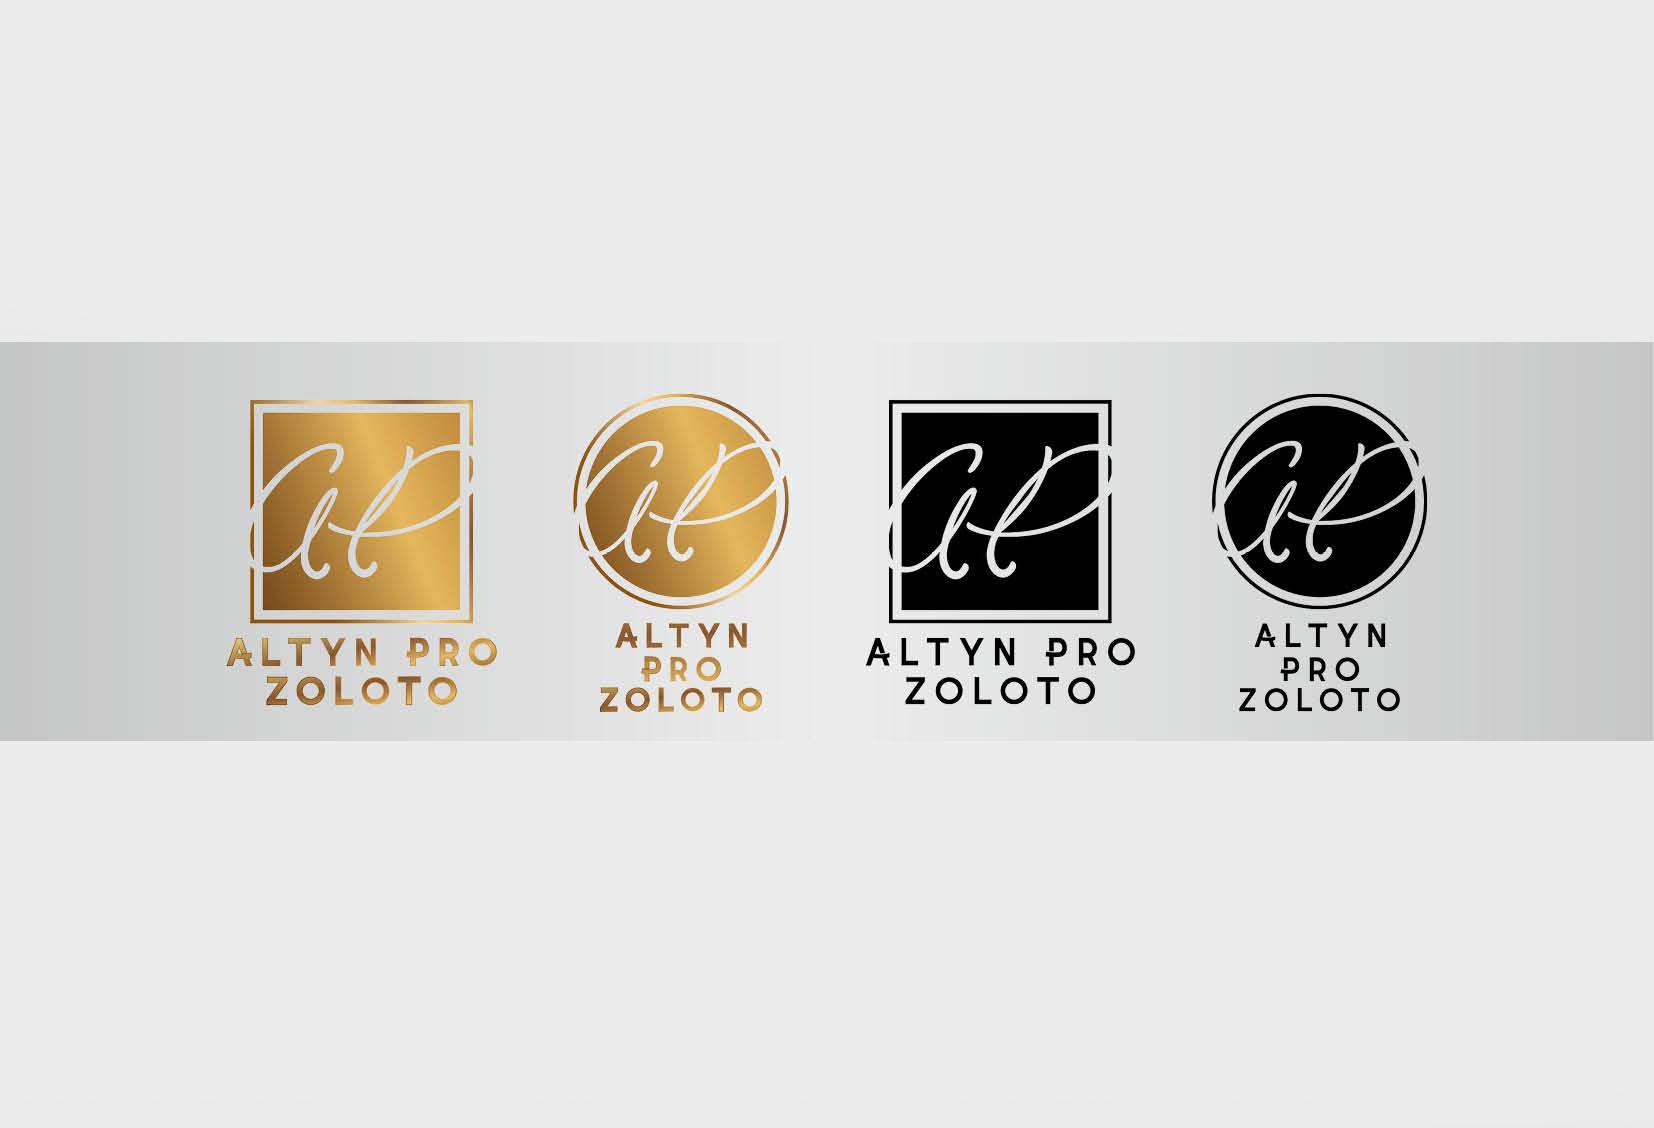 Разработка логотипа, Altyn proалматы,